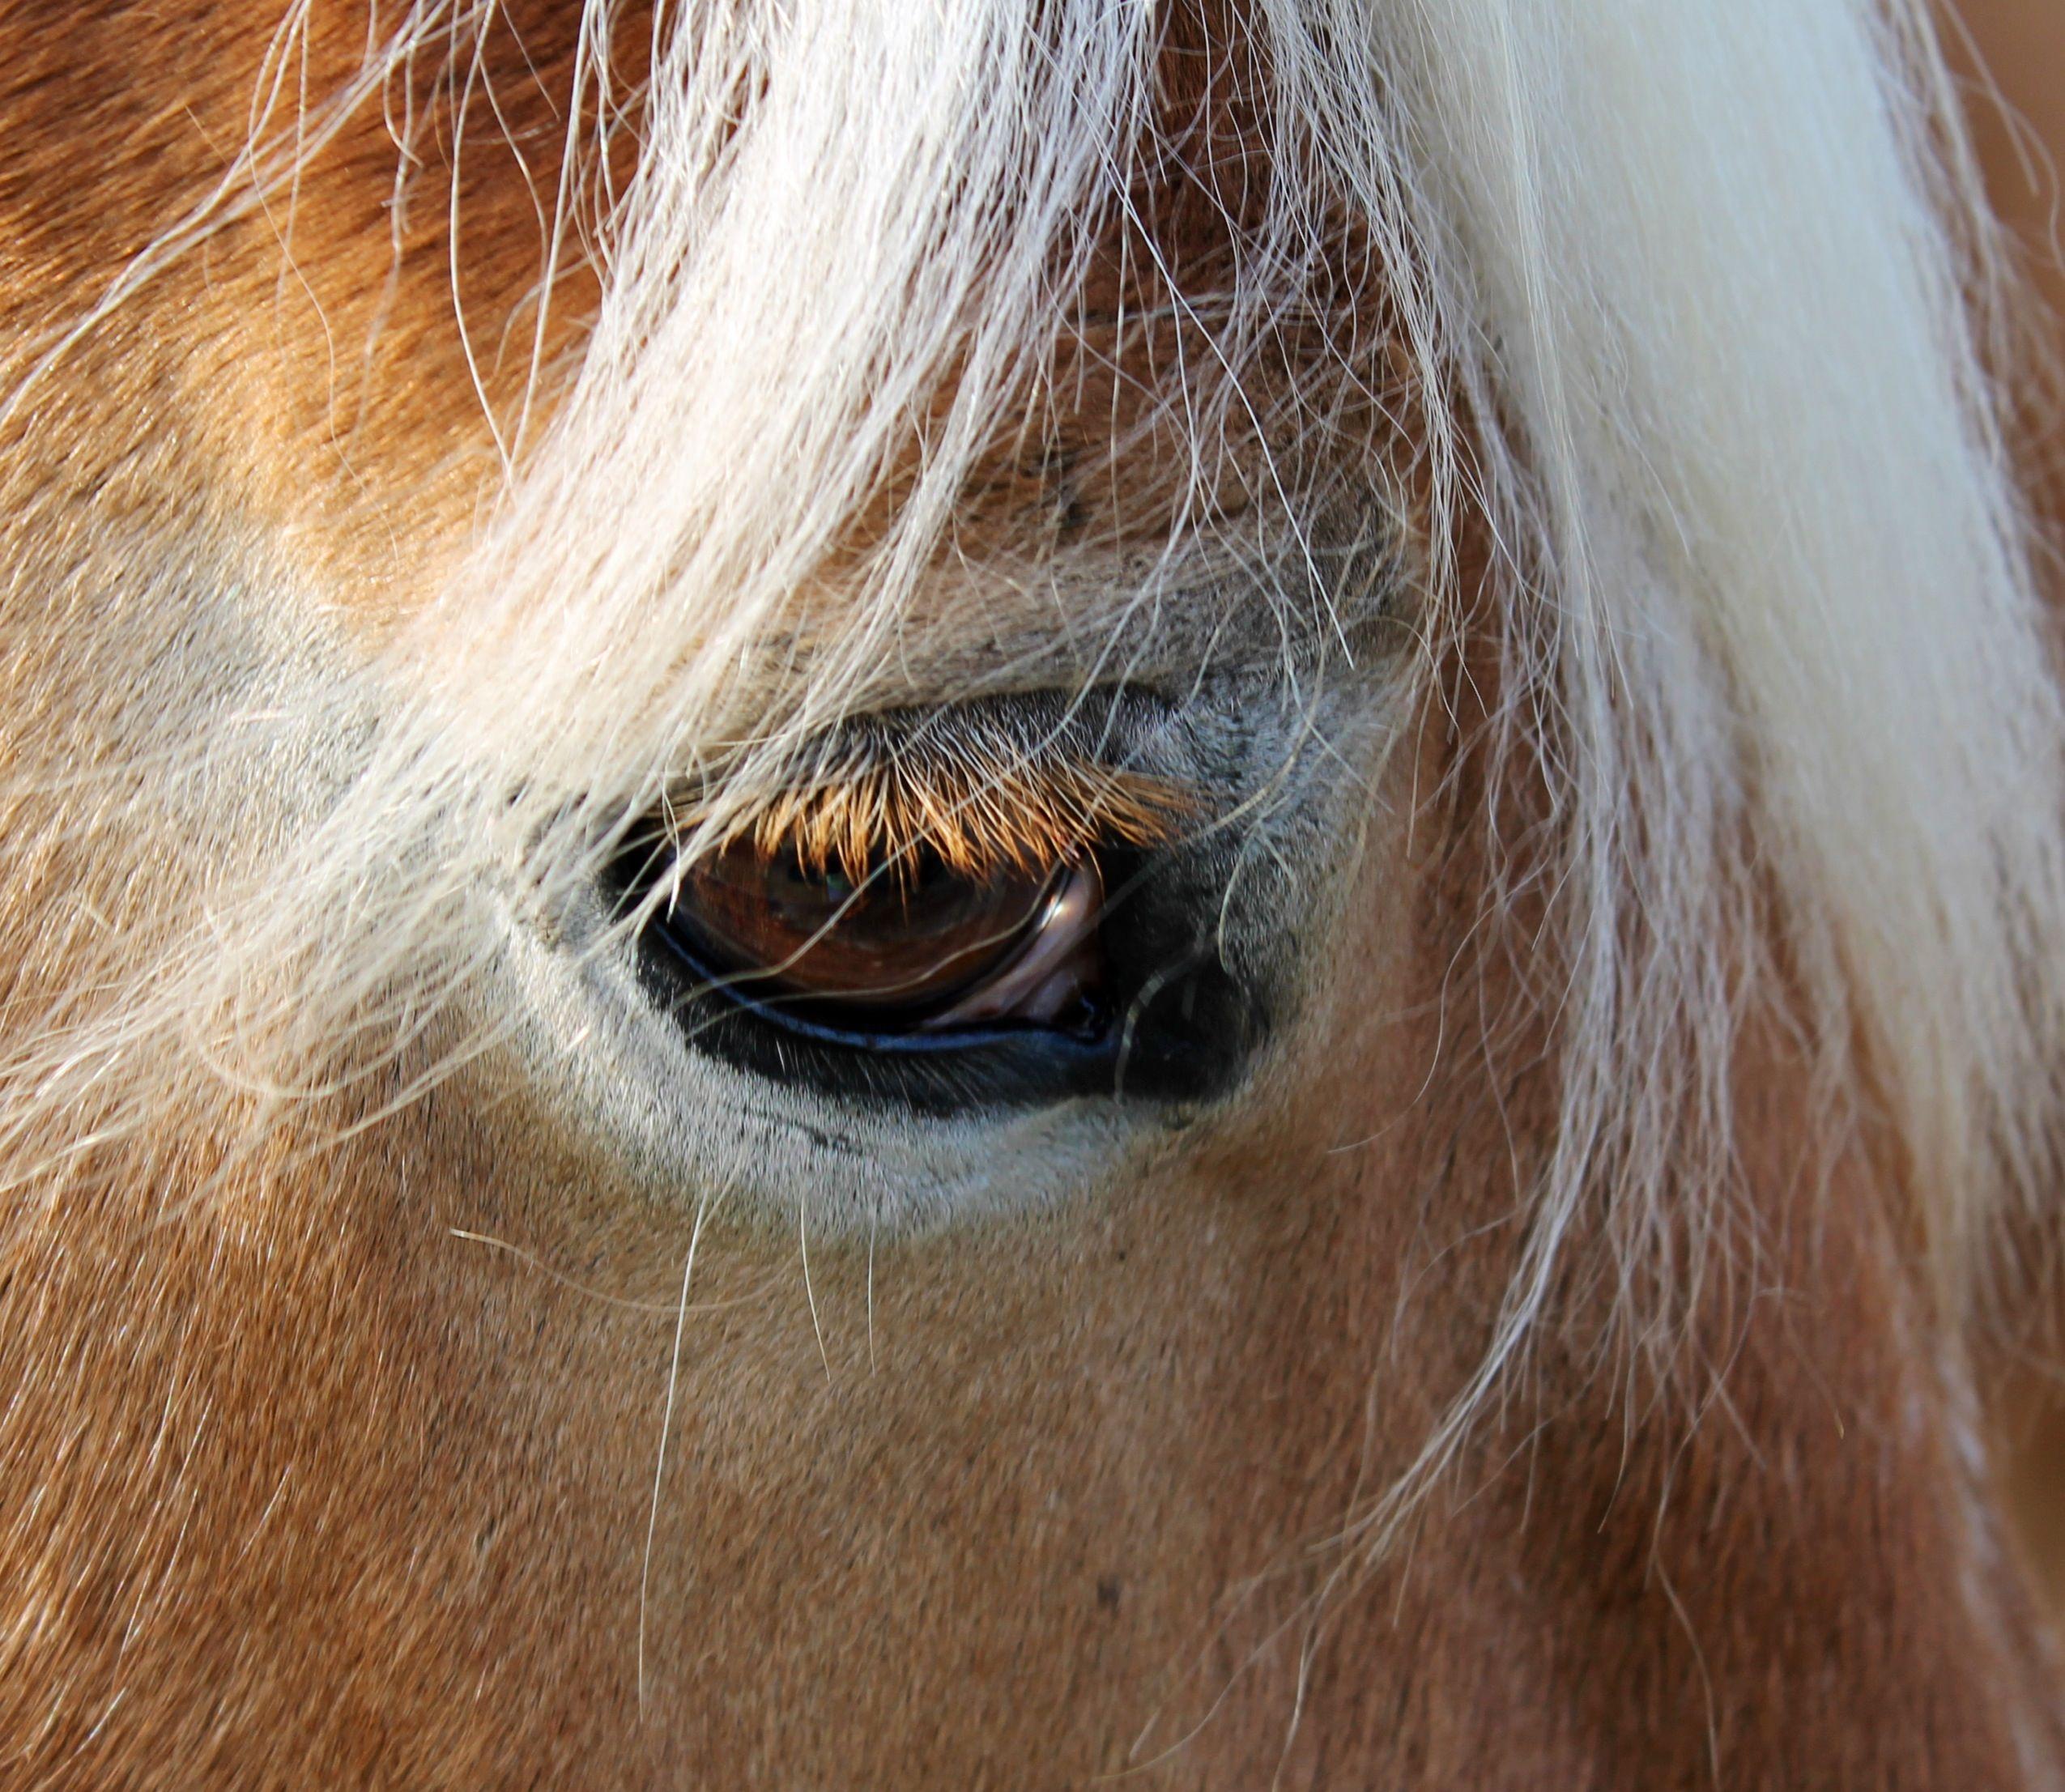 Beautiful horse eye Photo by Sarah L Myers